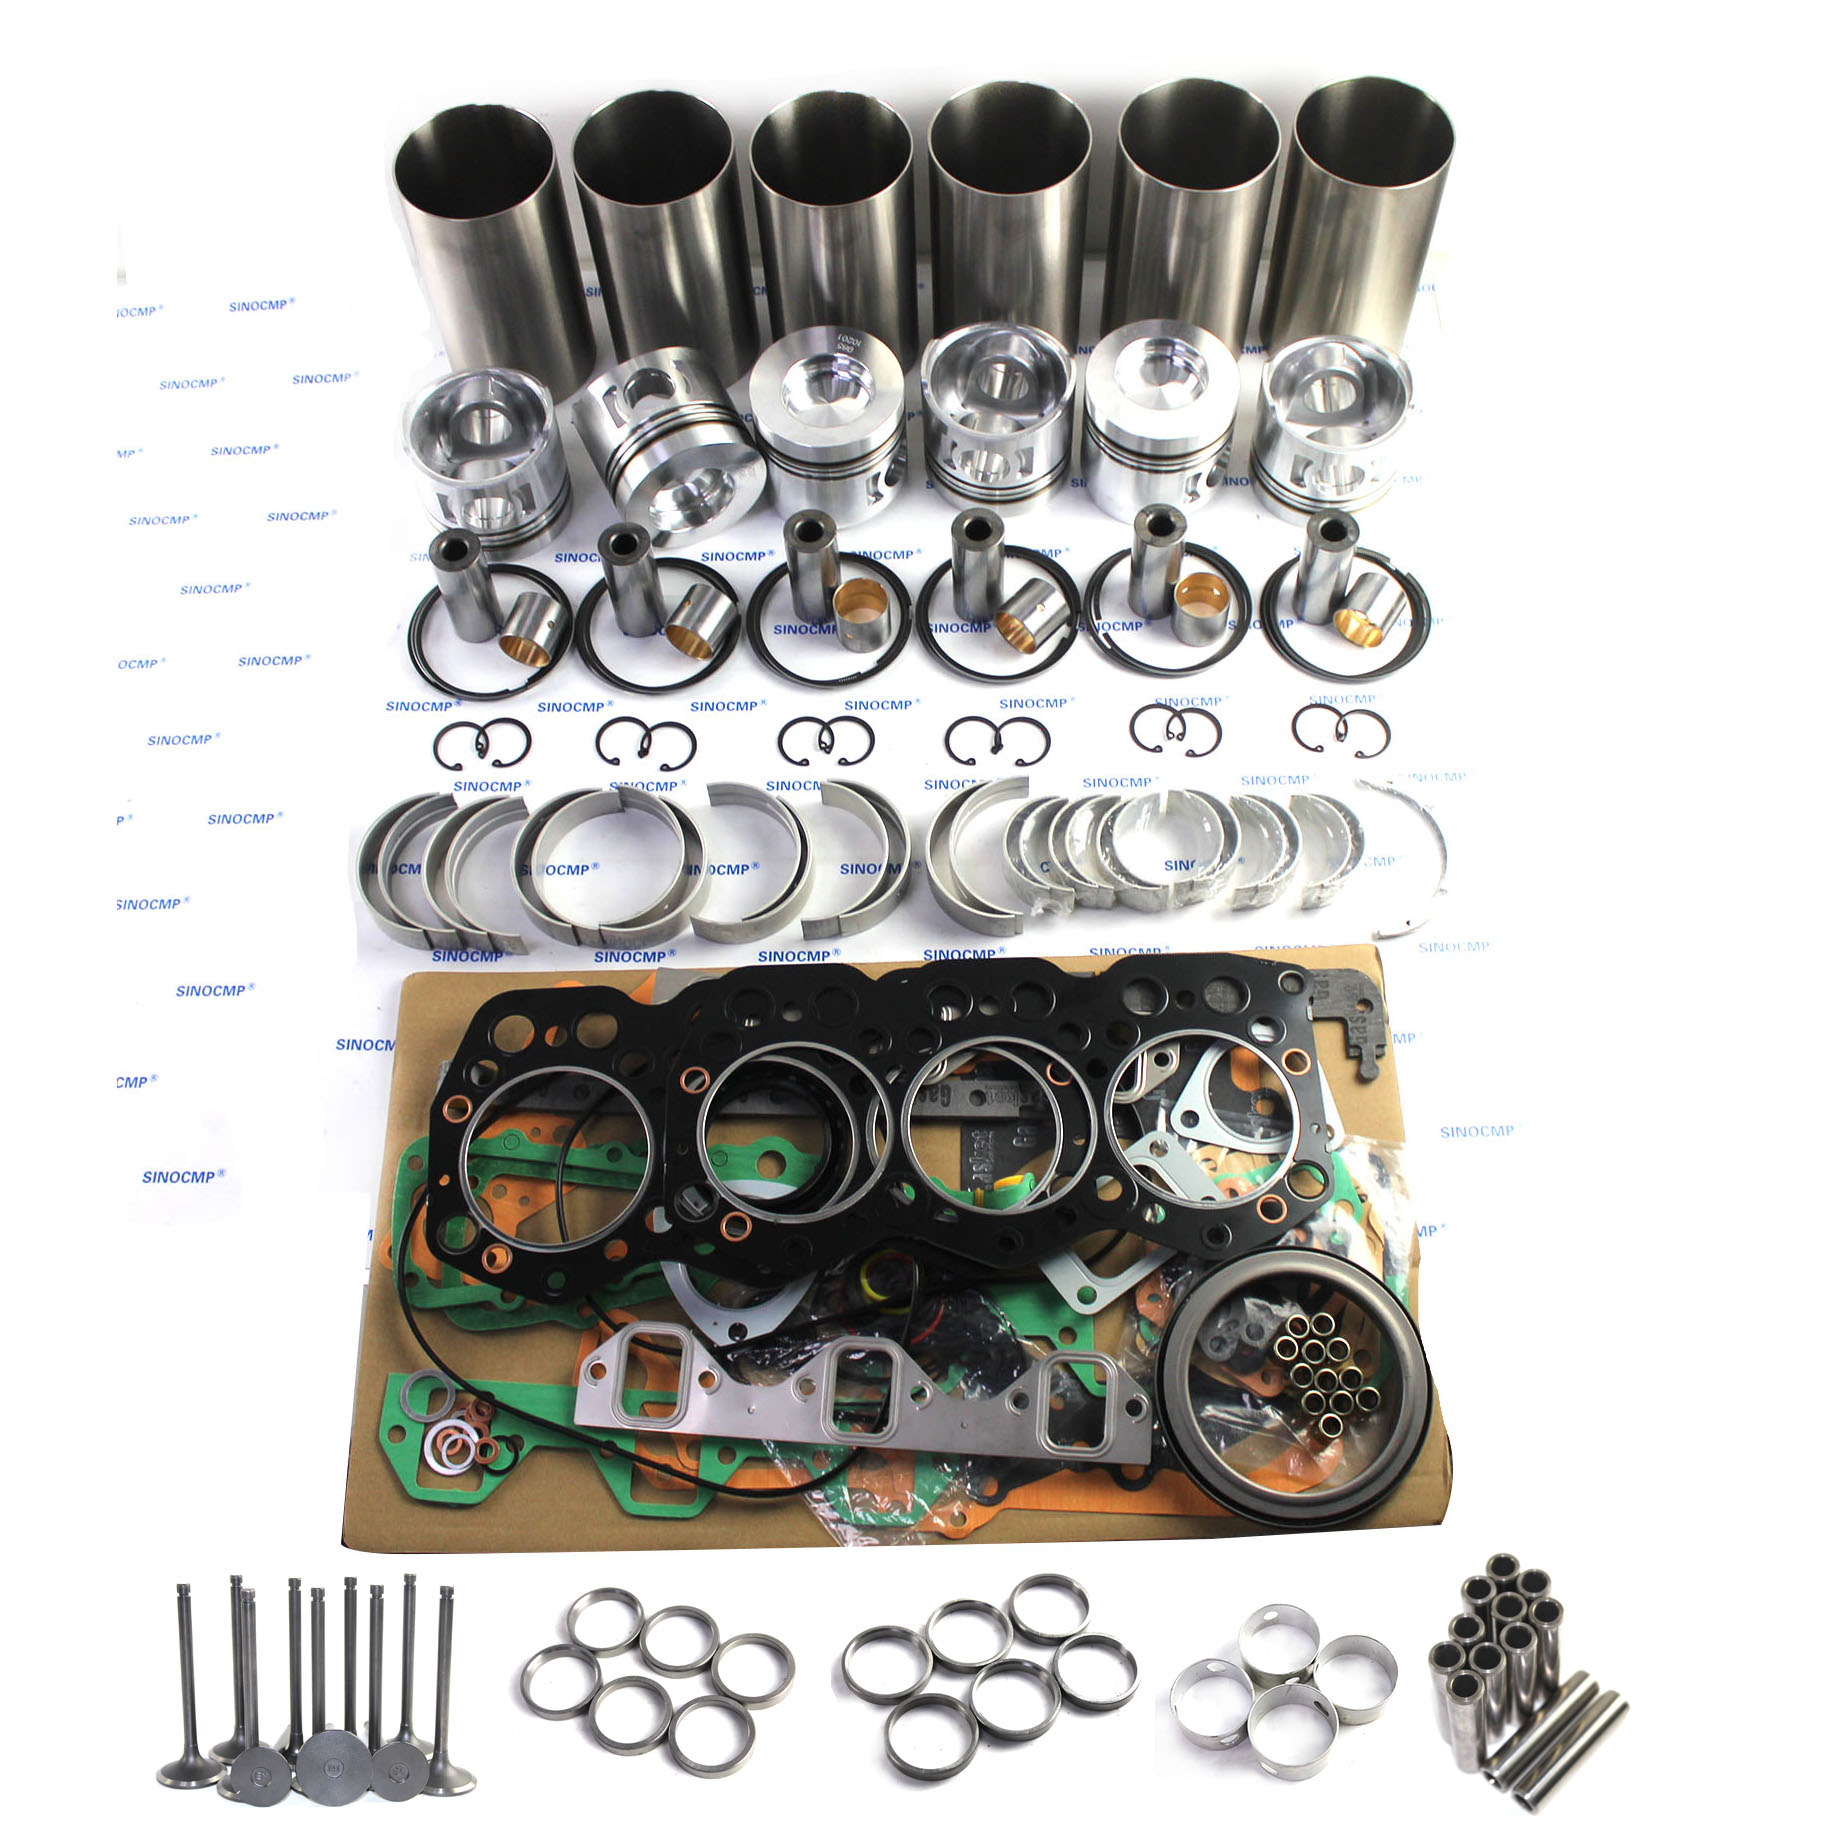 SA6D107E Overhaul Rebuild Kit for Komatsu Engine PC200-8 Excavator Repair Parts Pistons, Liners, Ring set, Bearing Sets